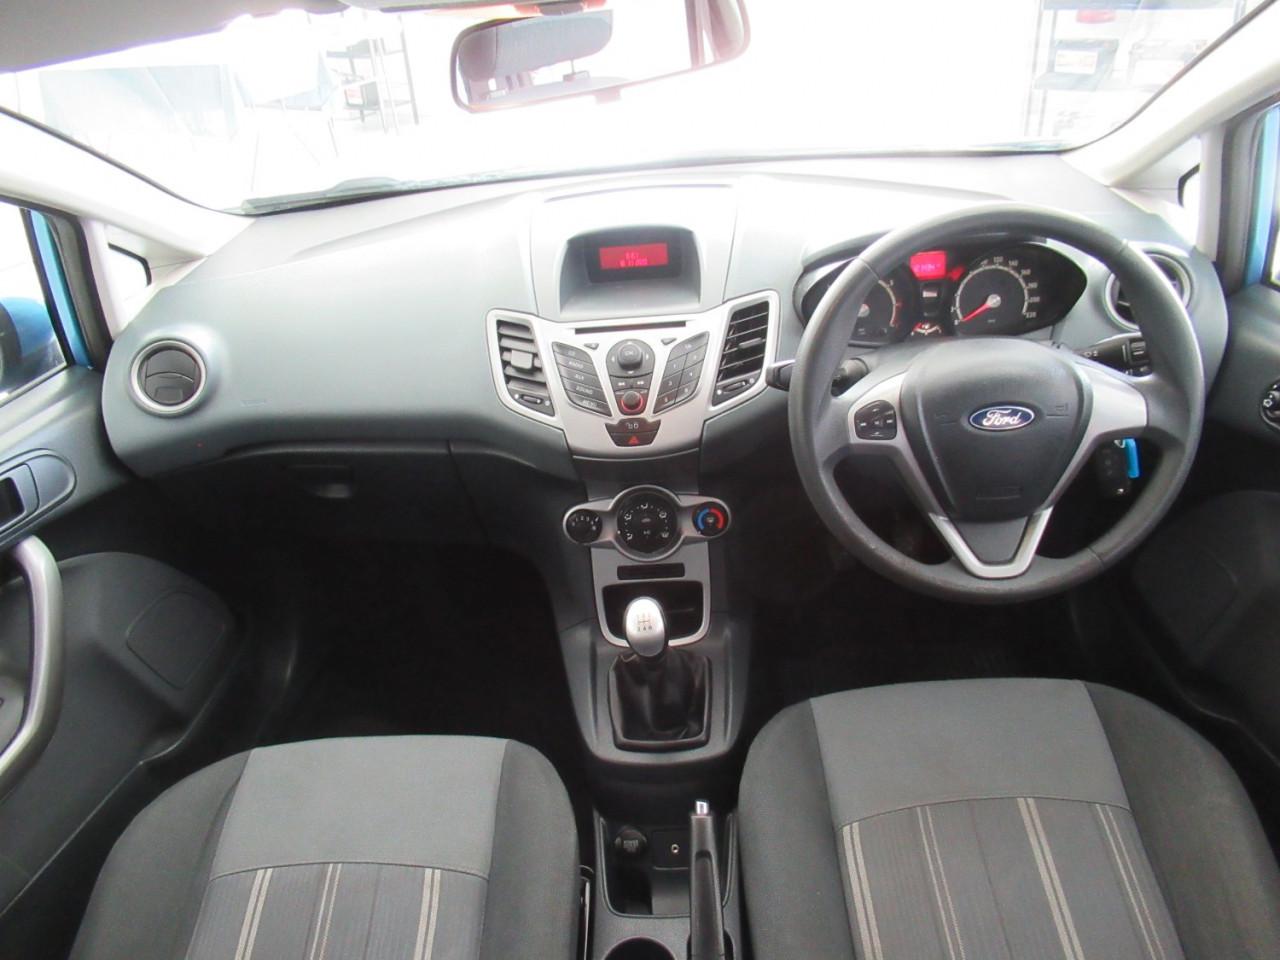 2009 Ford Fiesta WS CL Hatchback Image 19